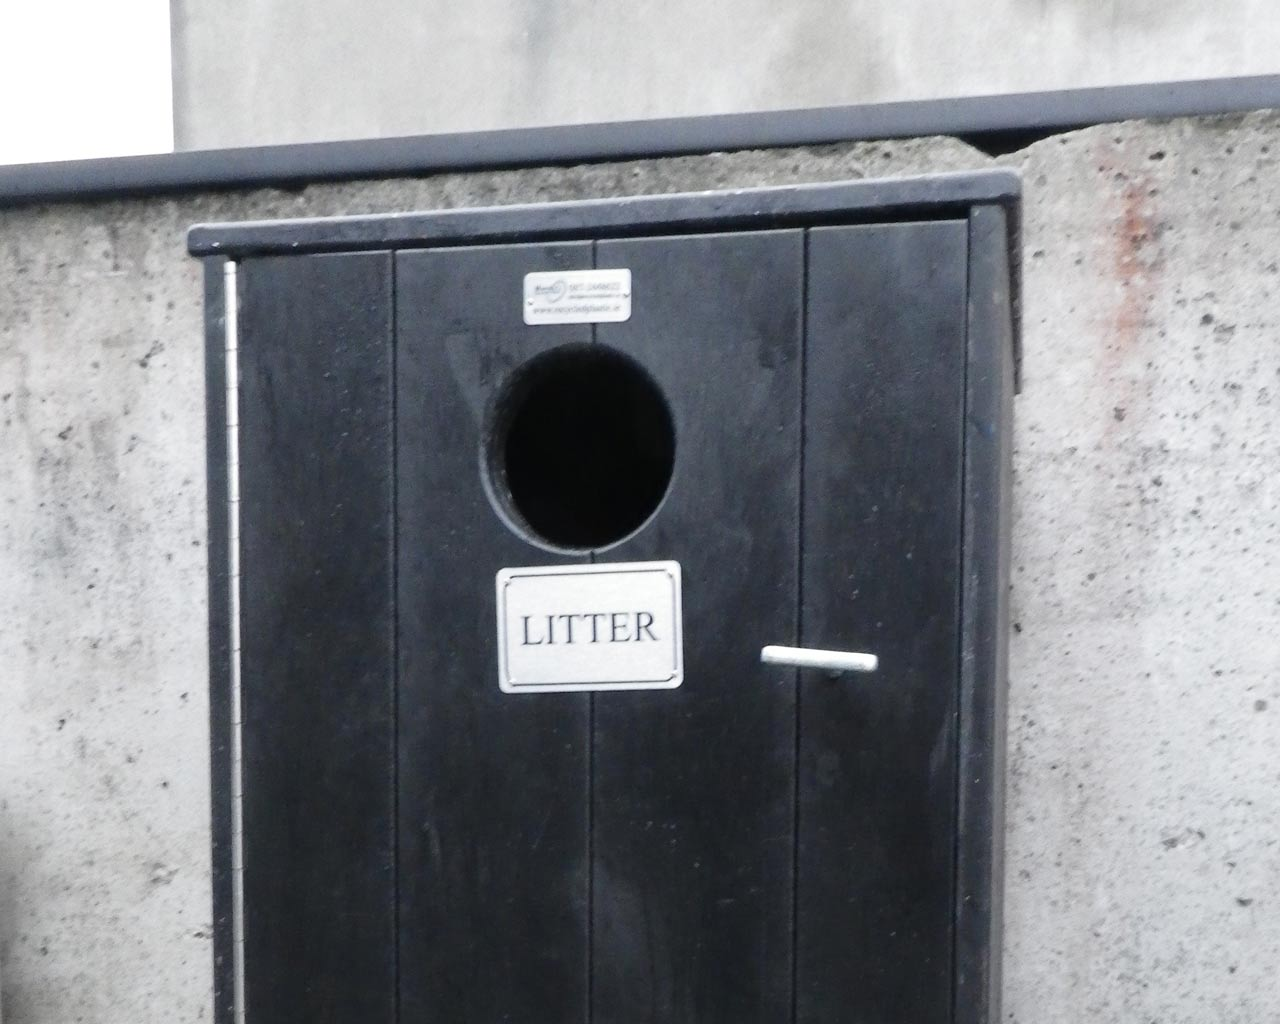 Litter Bin Without Ashtray